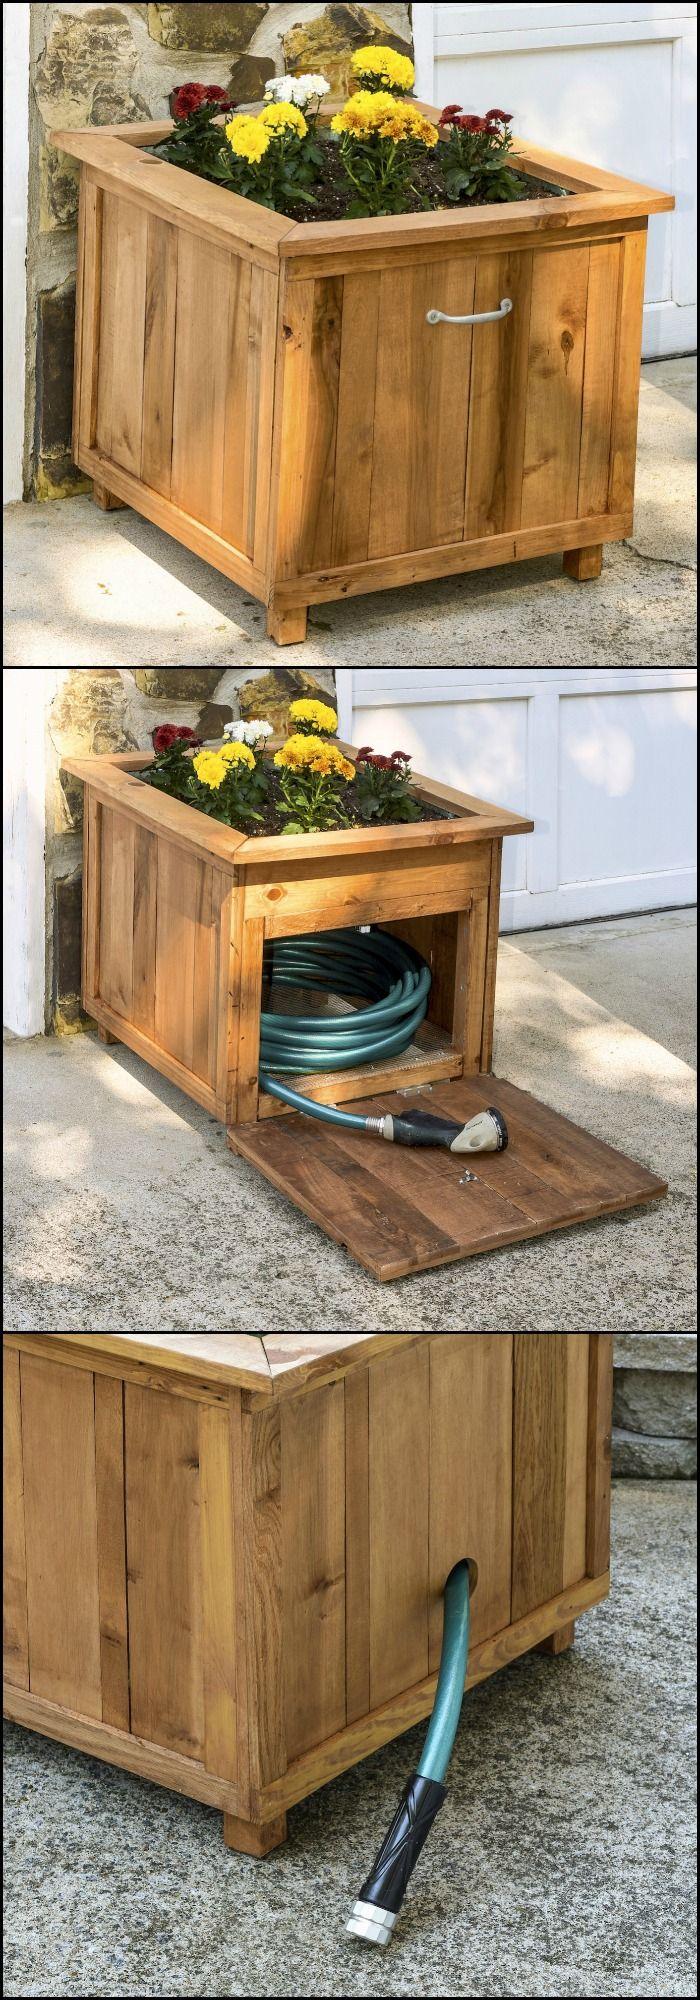 Hide your garden hose in this DIY hose storage with